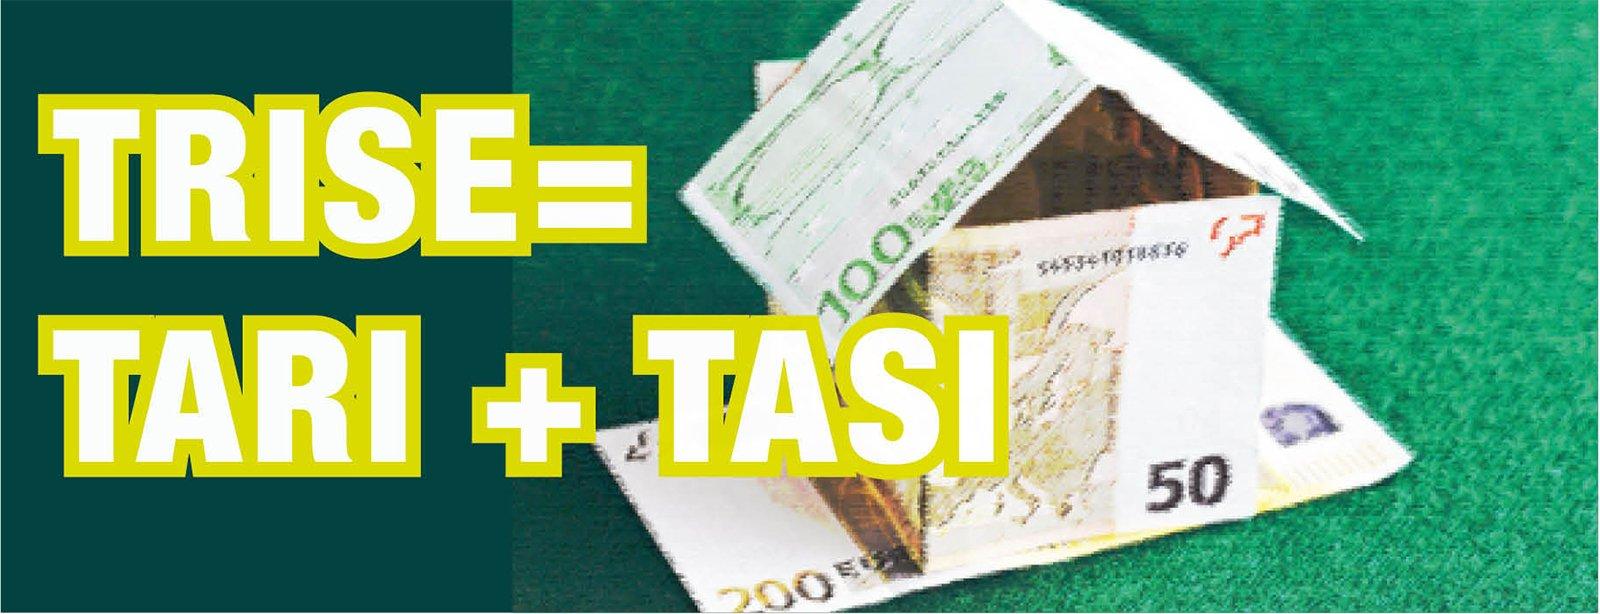 Trise tari e tasi saranno le nuove tasse sulla casa for Tasi e tari